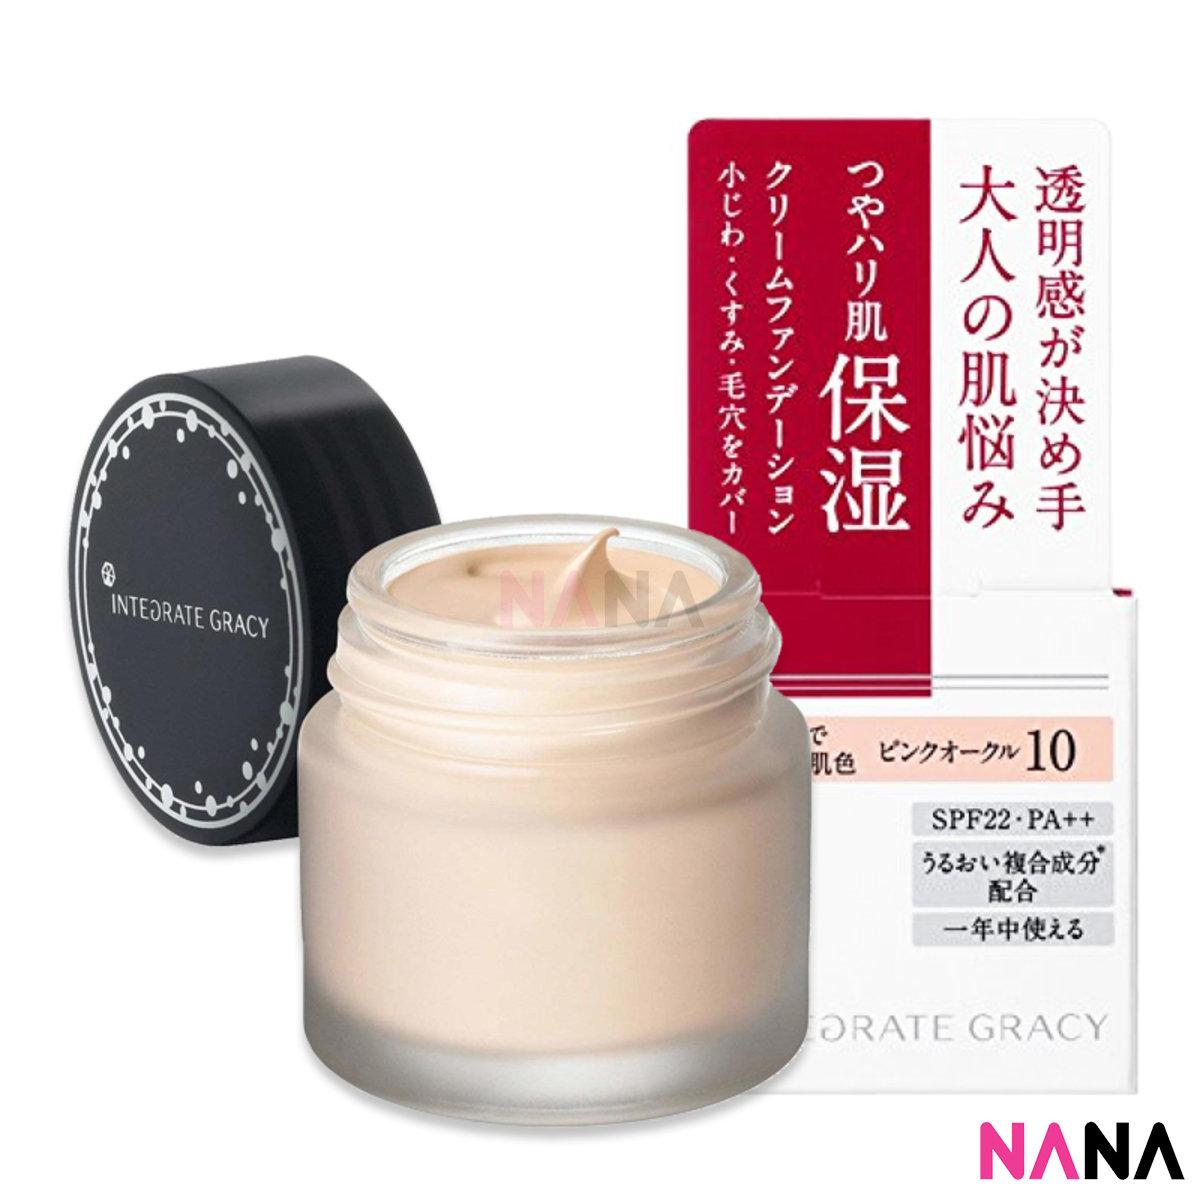 Integrate Gracy Moist Cream Foundation Rich Moisture SPF22 PA++ 25g PO-10